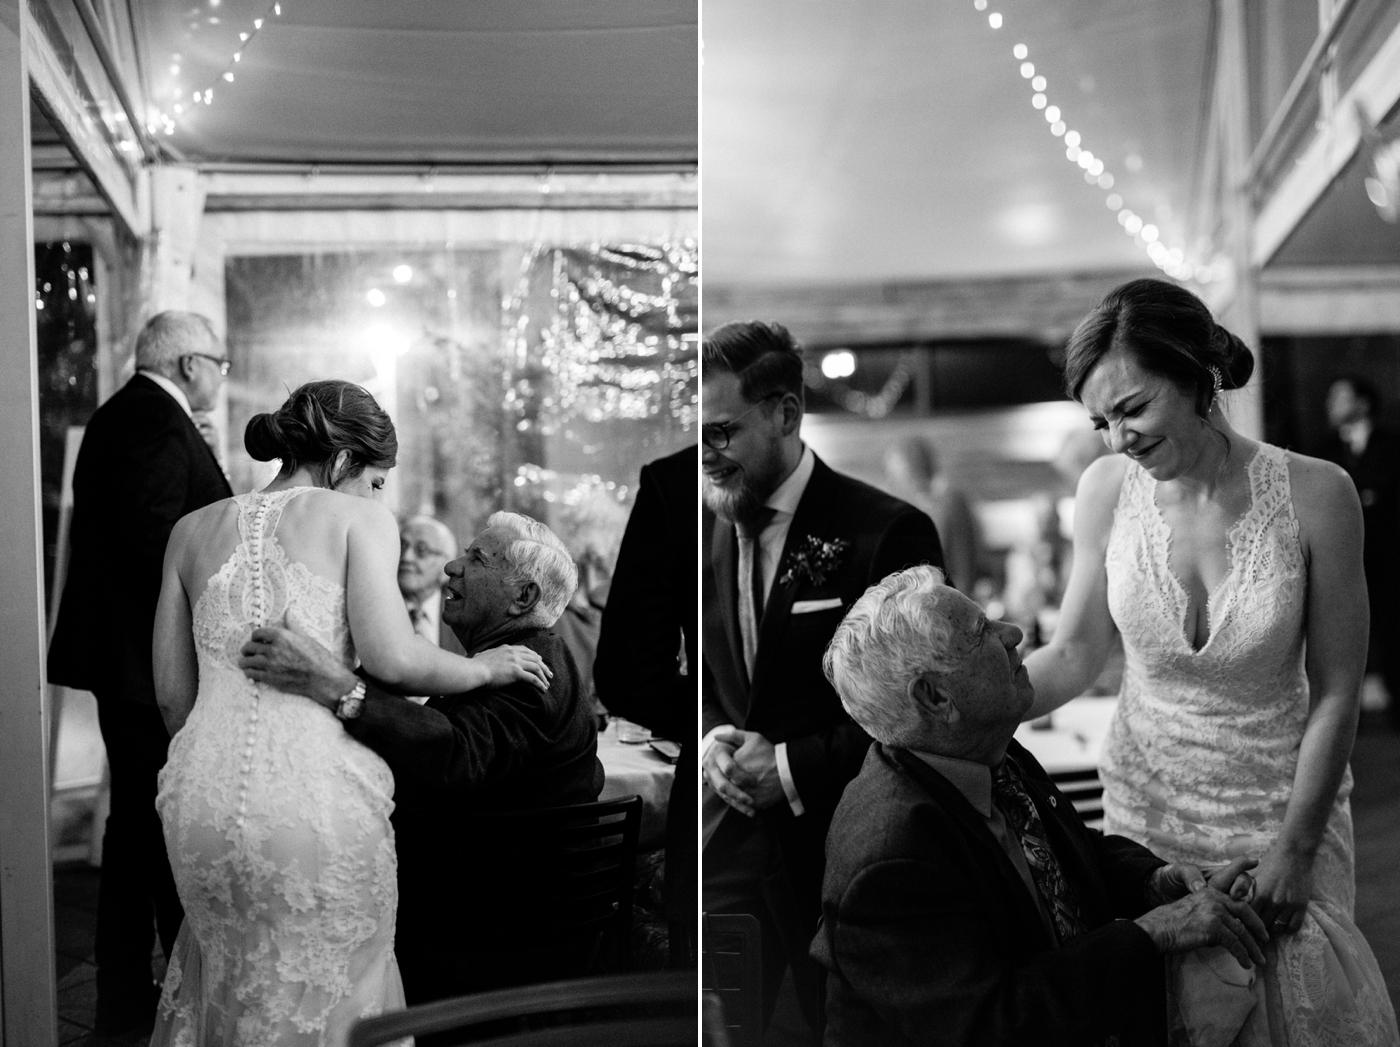 Erin & Ryan - Natural Wedding Photographer in Adelaide - Maximillians Wedding - Simple and Modern Wedding Photographer - Katherine Schultz - www.katherineschultzphotography.com_0059.jpg